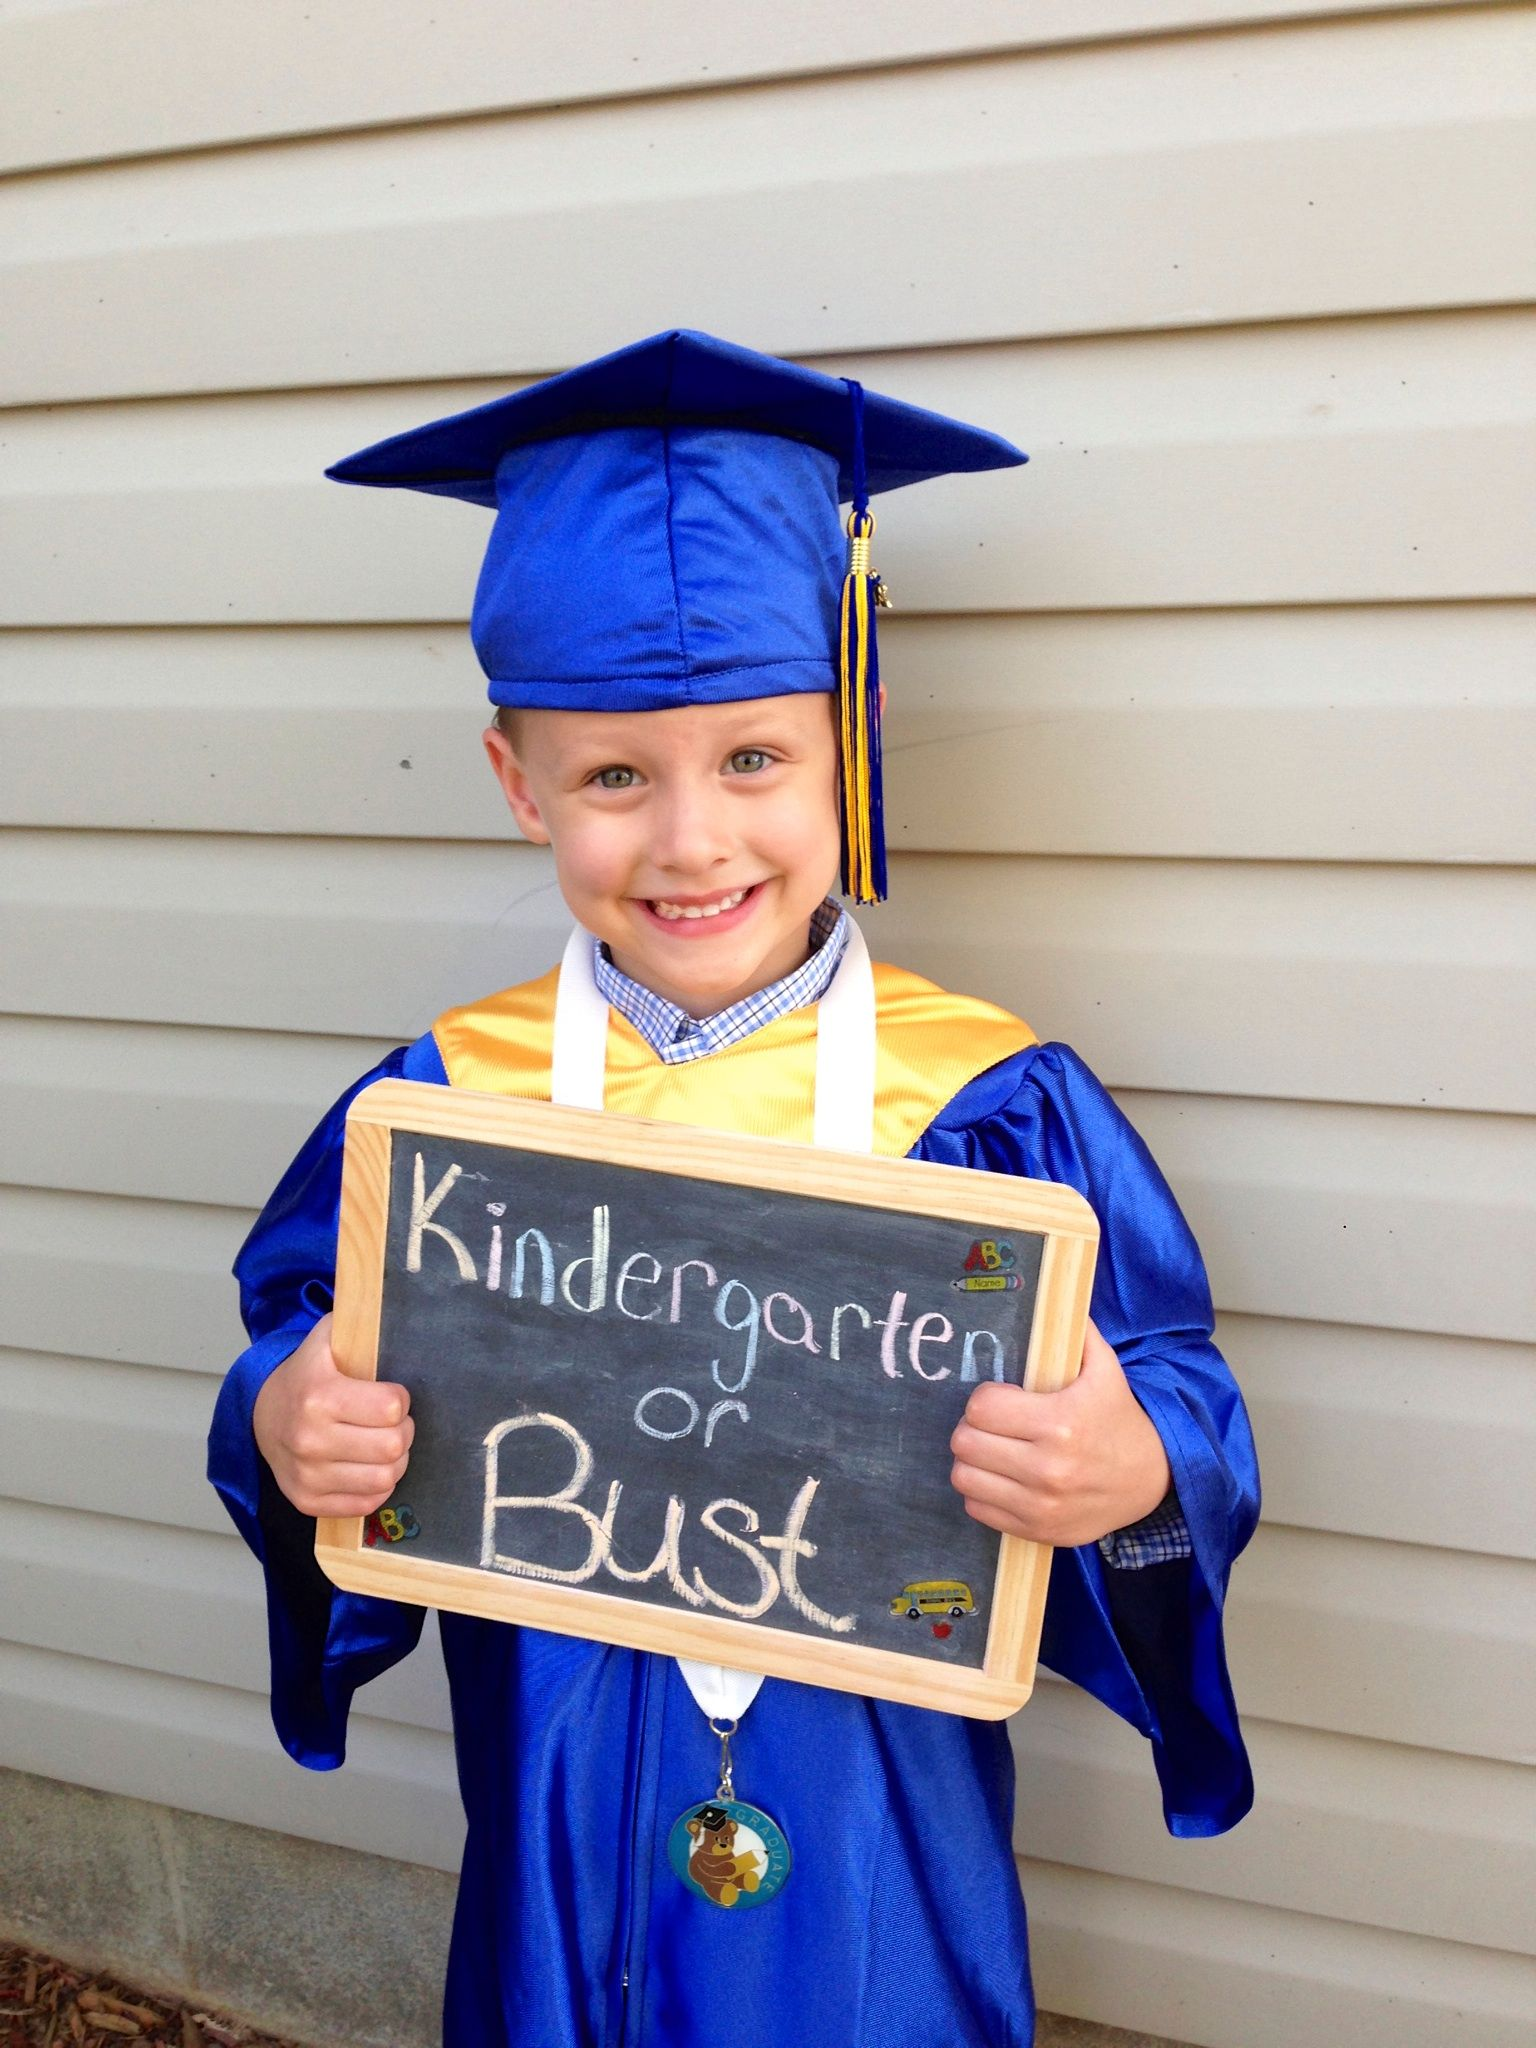 61a12dfa956 Pre-K graduation photo. Kindergarten or Bust